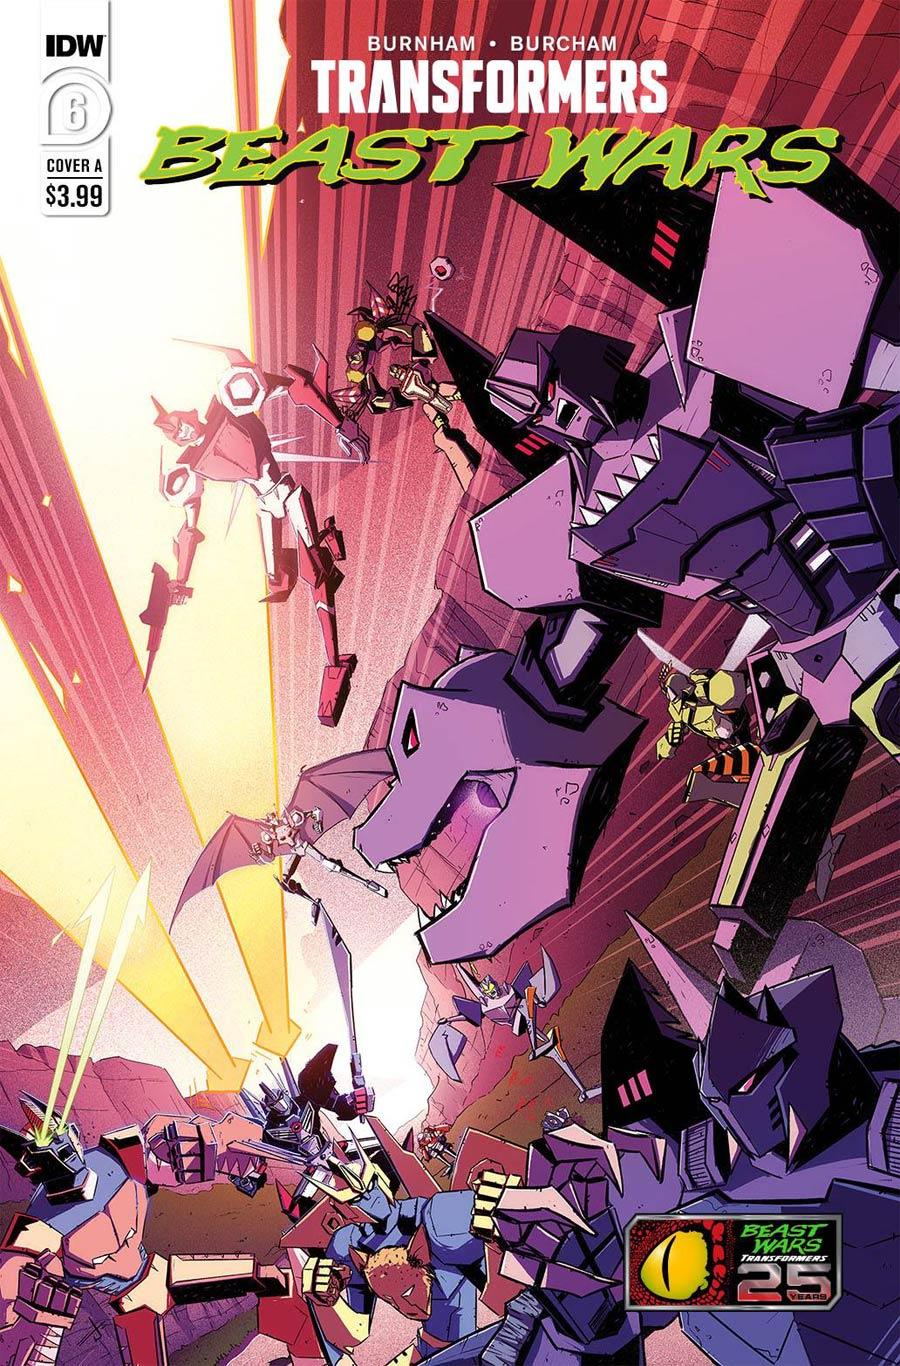 Transformers Beast Wars Vol 2 #6 Cover A Regular Josh Burcham Cover